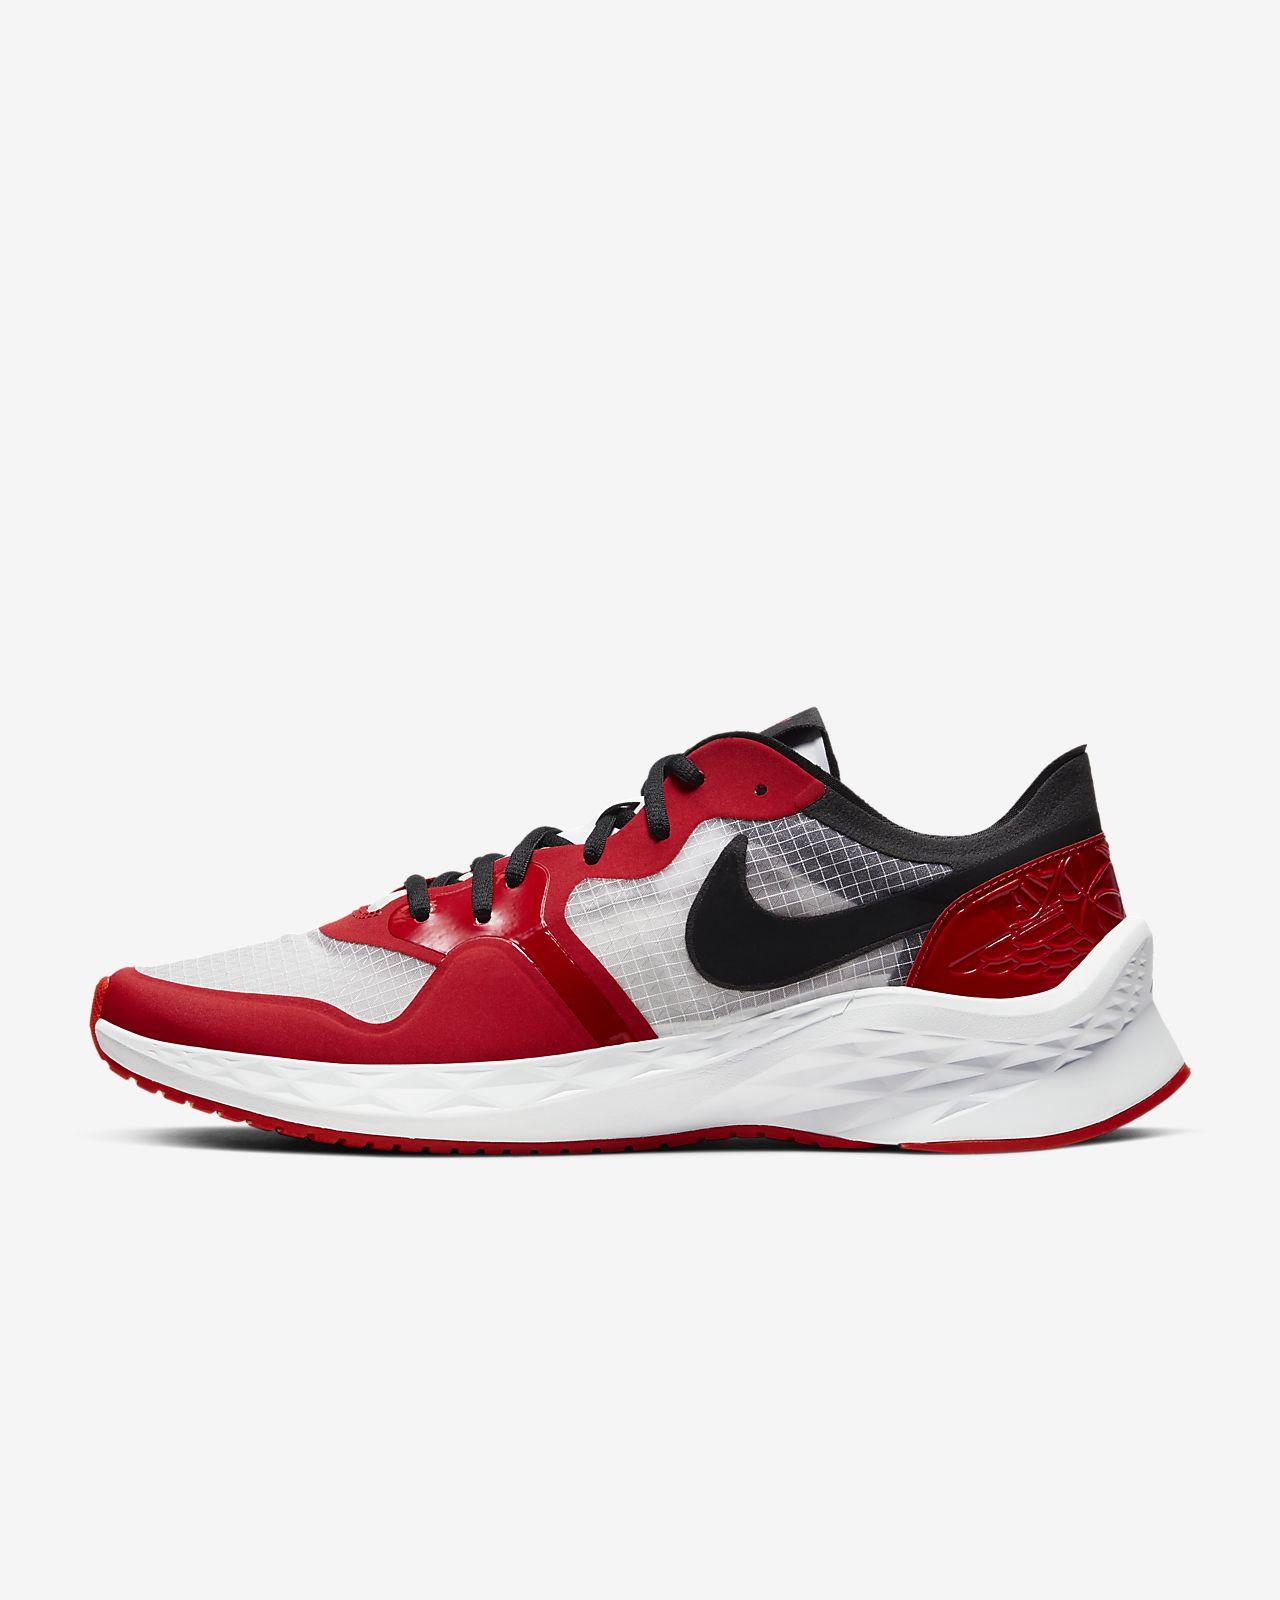 shoe websites for nike and jordan